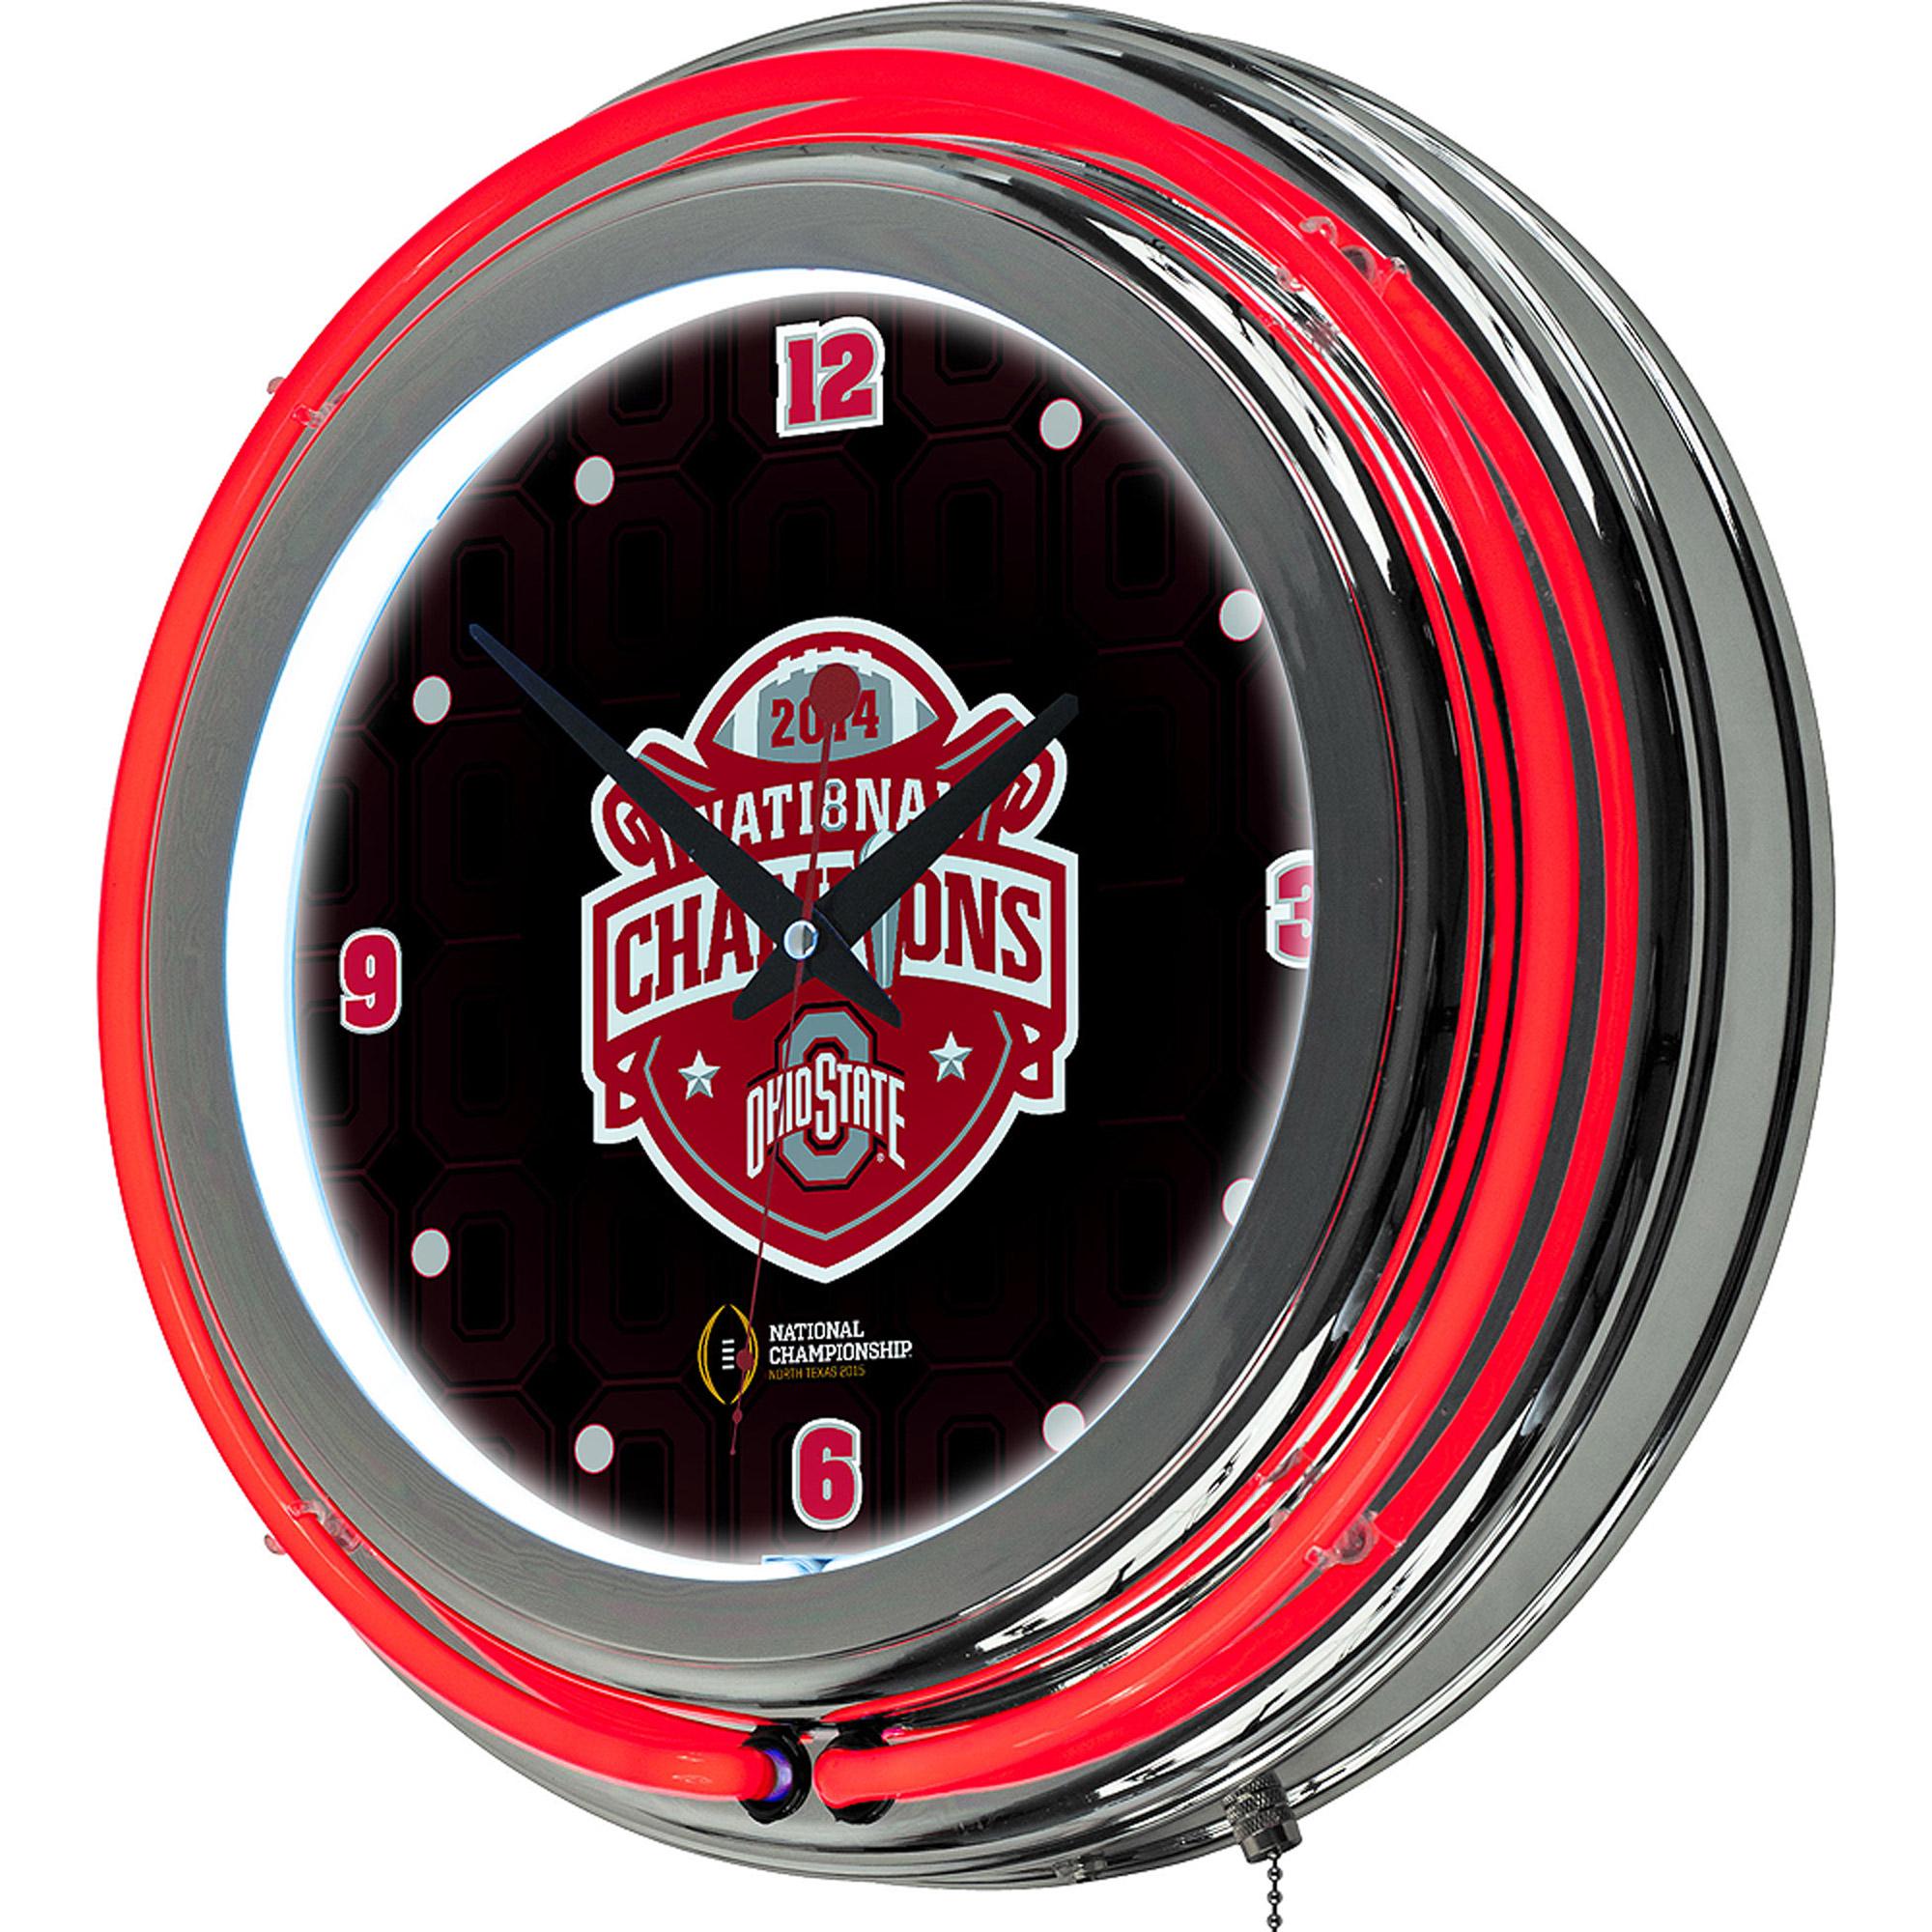 Ohio State University National Champions Chrome Neon Clock, Fade